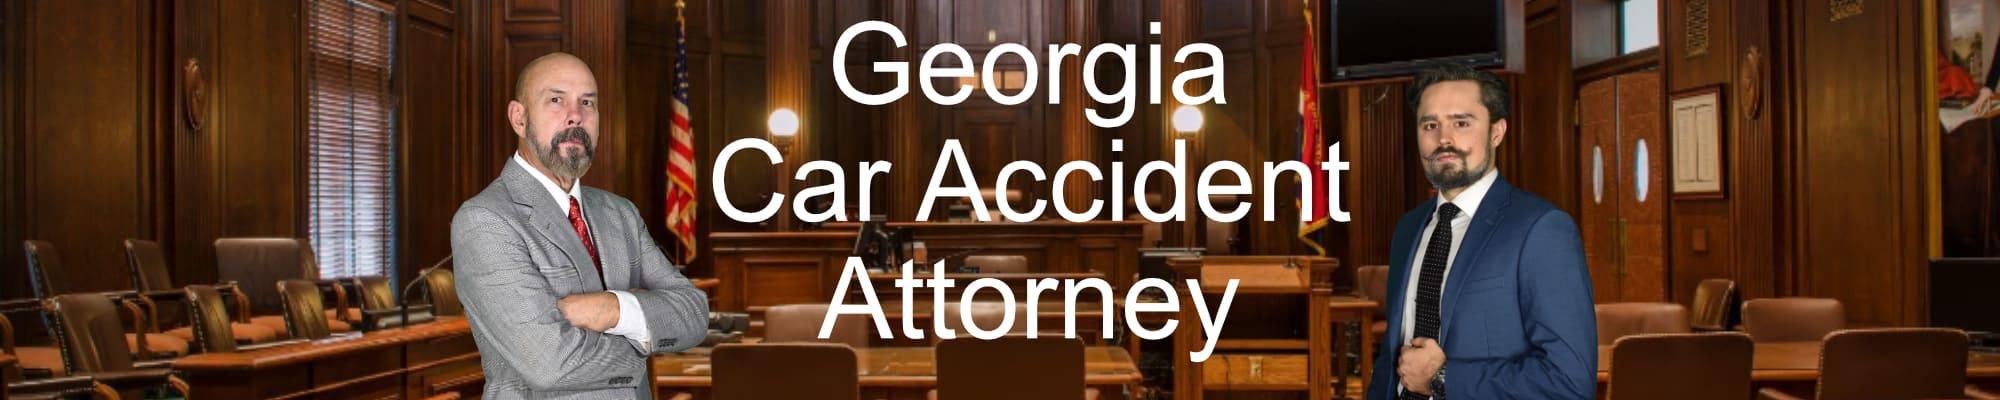 Georgia-Car-Accident-Attorney-Personal-Injury-Lawyer-Settlement-Merck-Law-LLC-